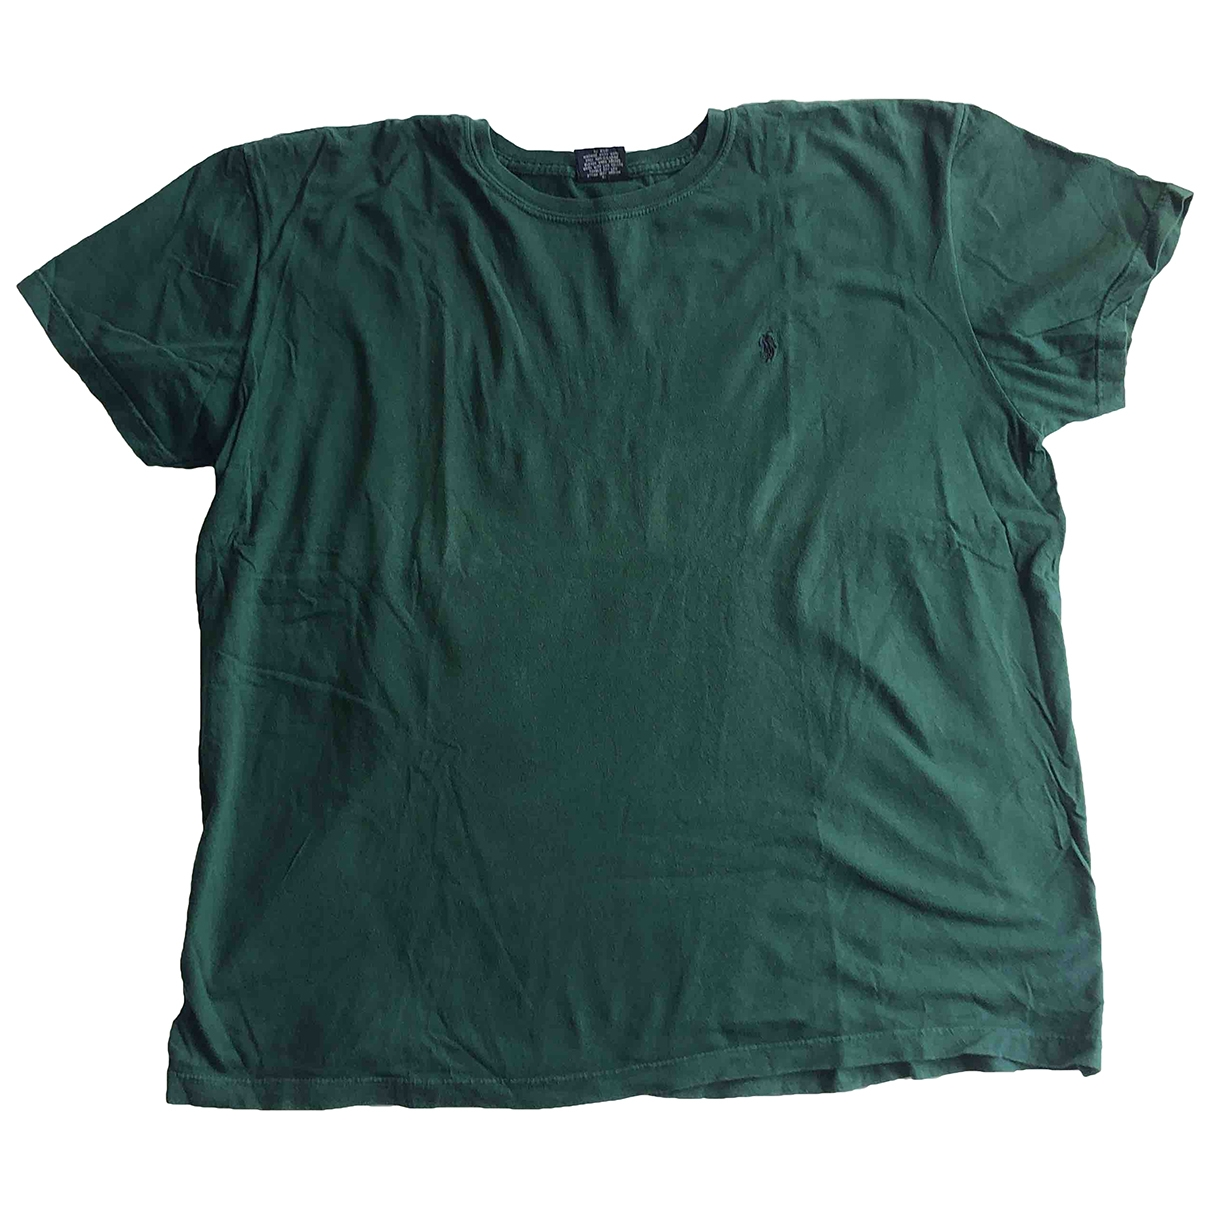 Polo Ralph Lauren \N Green Cotton T-shirts for Men L International